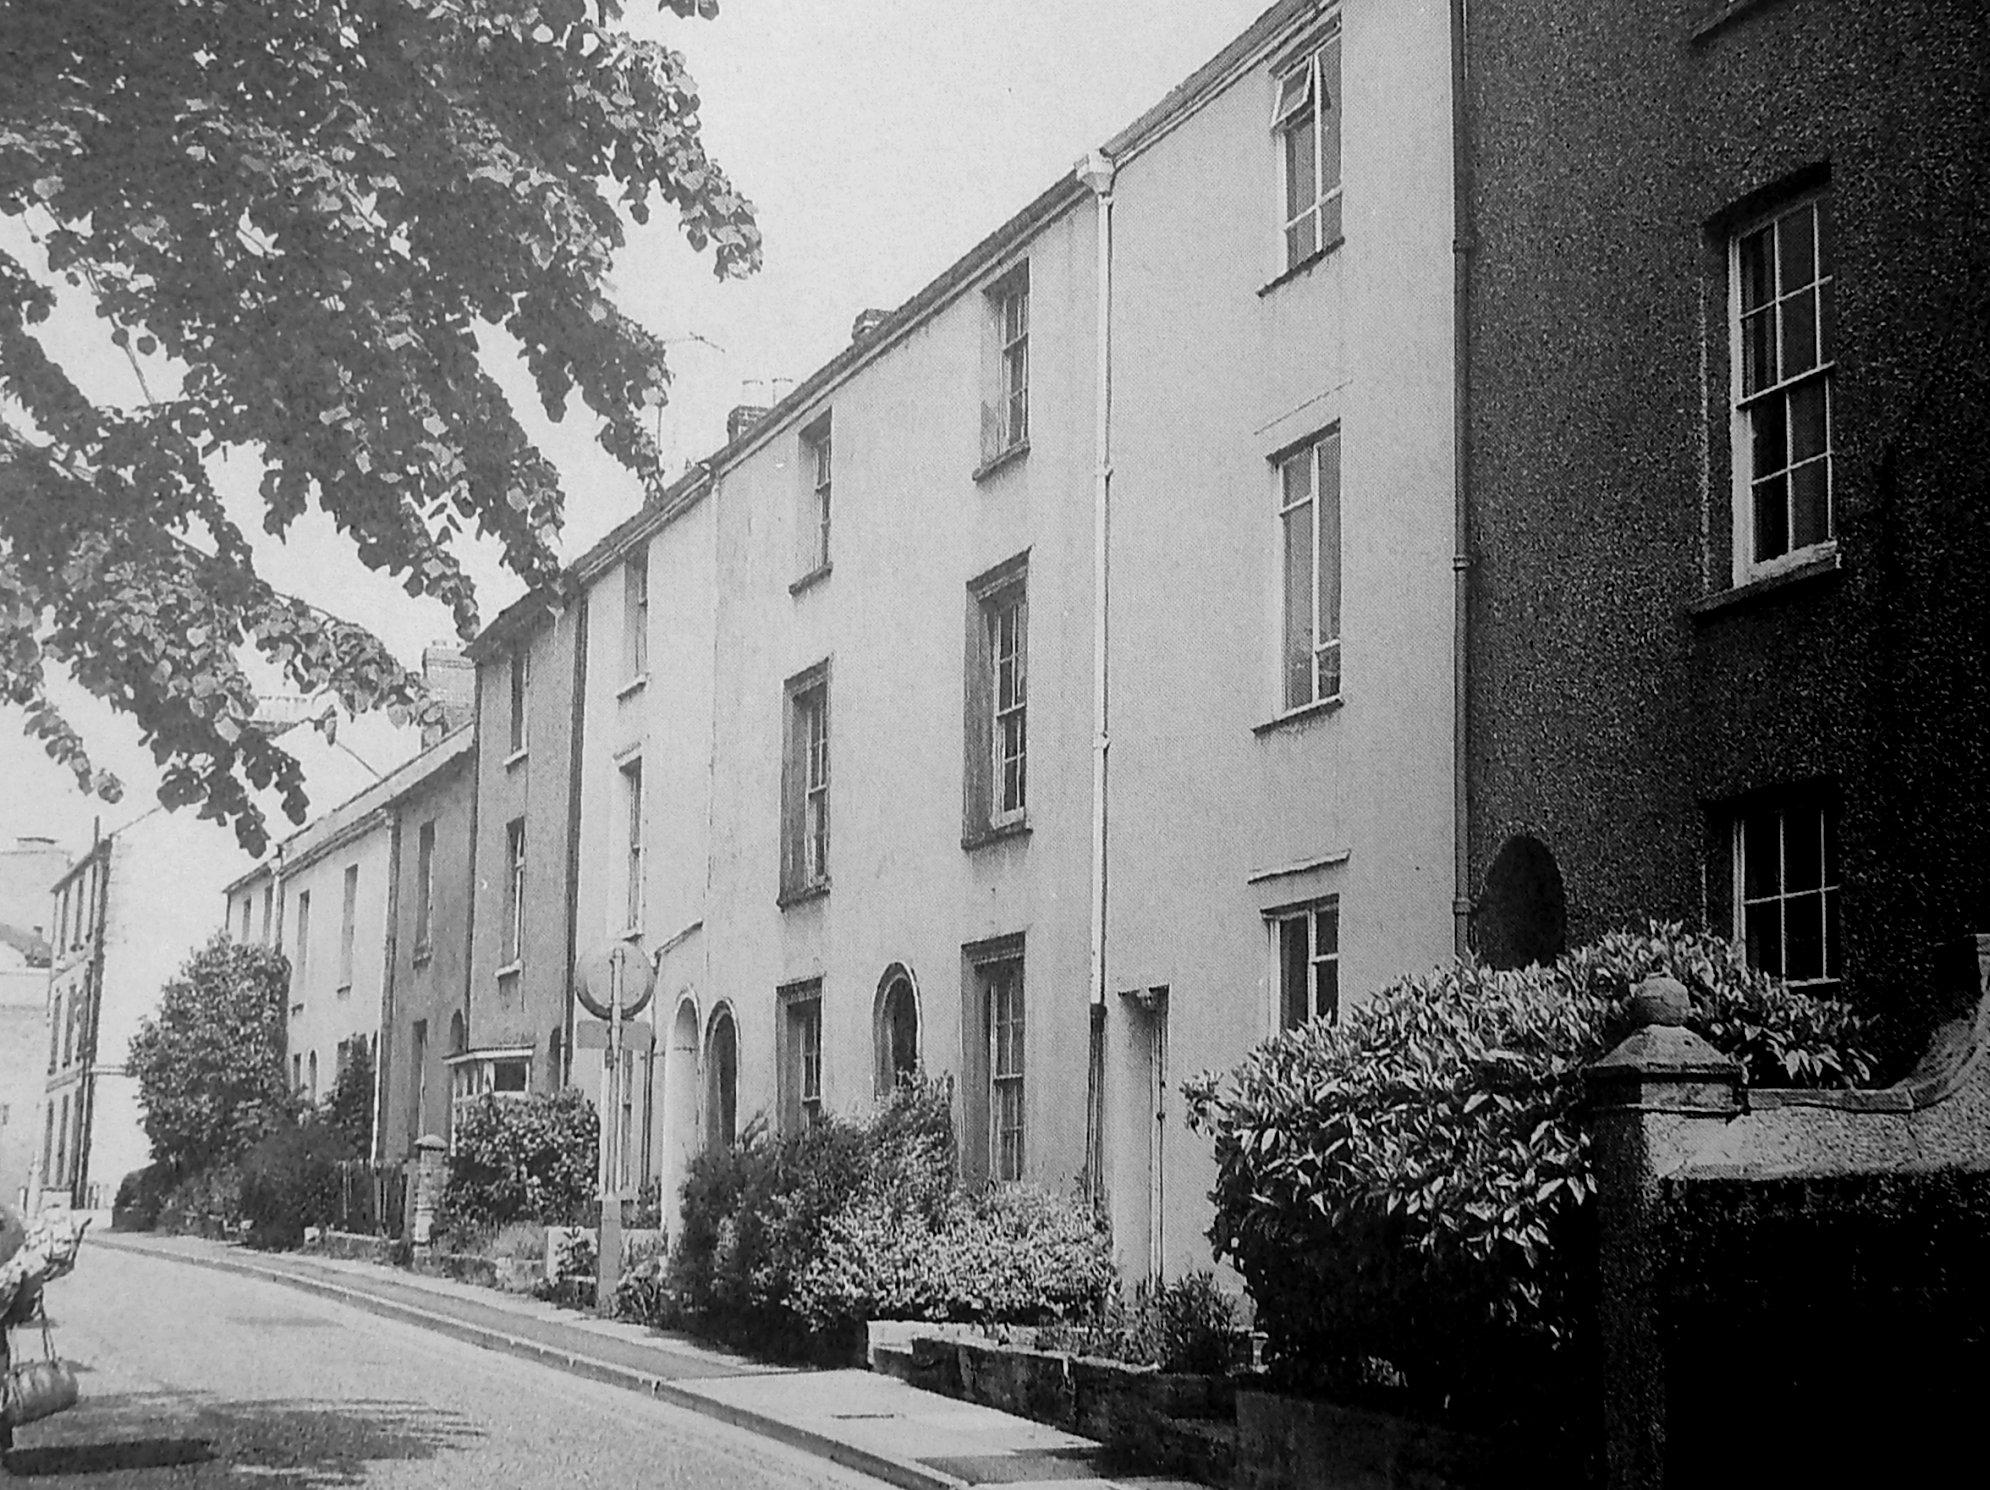 Peter Street 3 - 1968